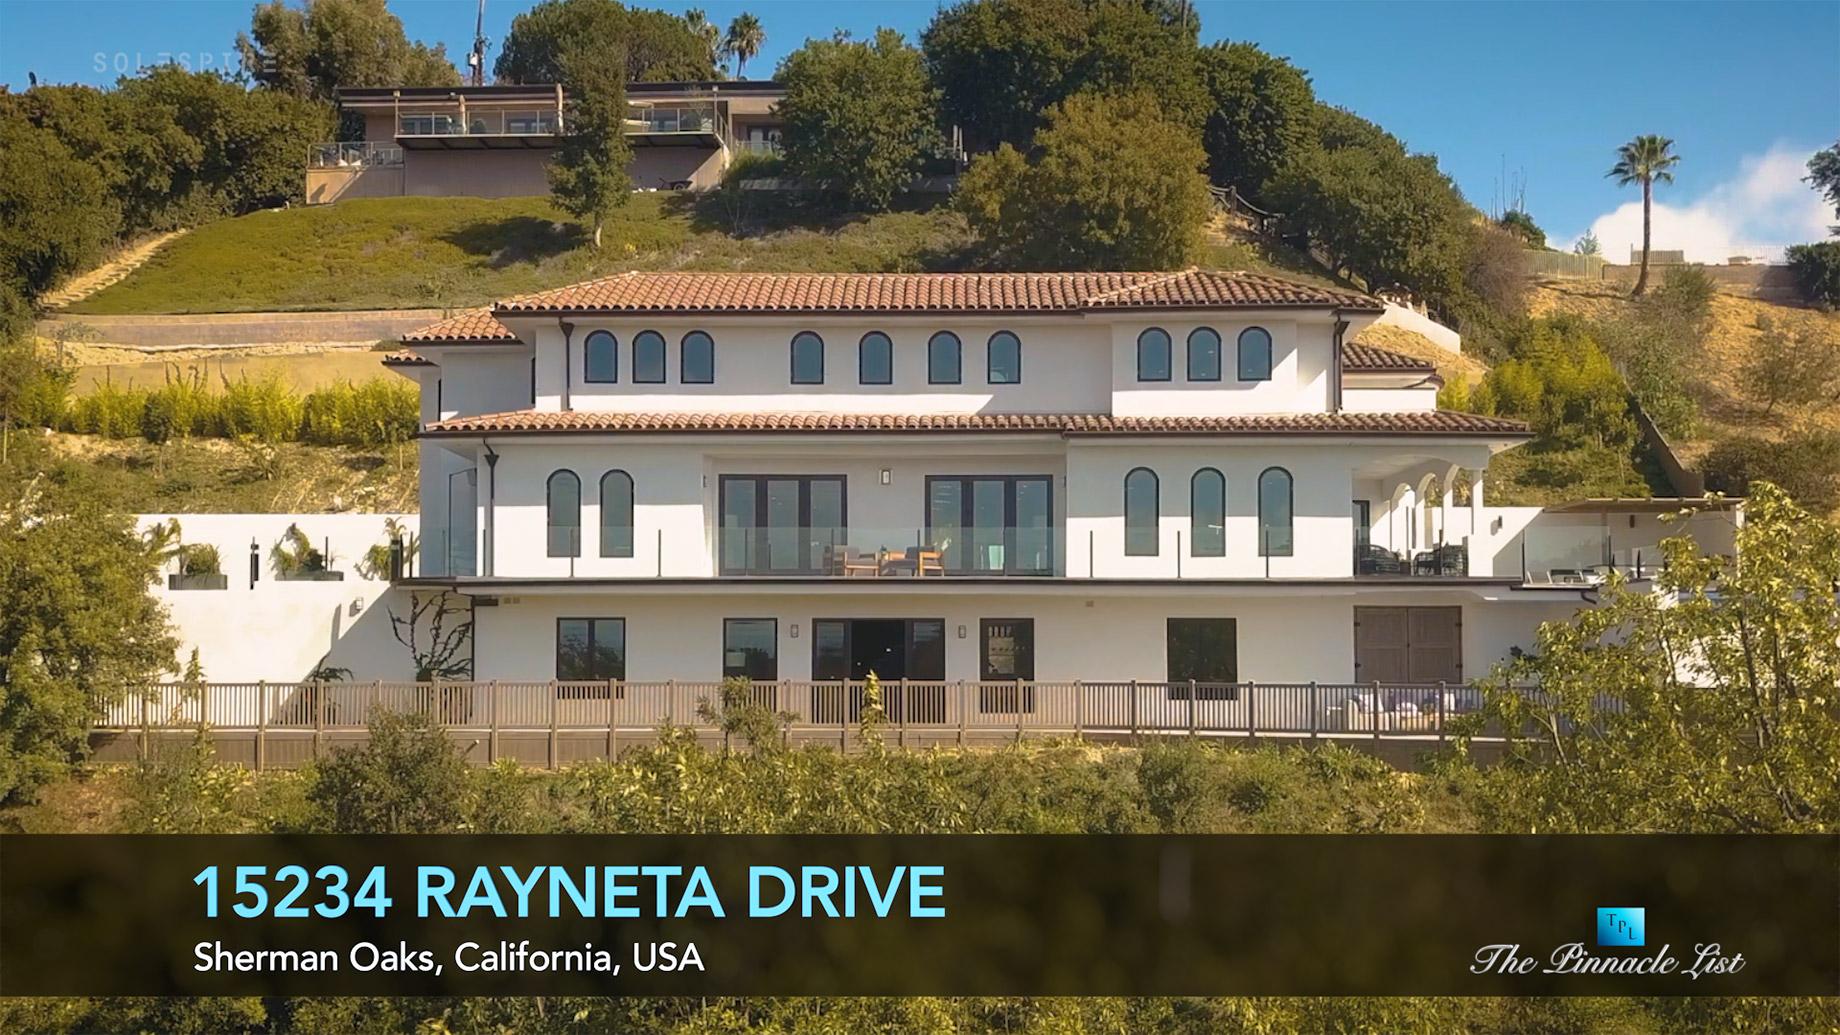 15234 Rayneta Dr, Sherman Oaks, California, USA